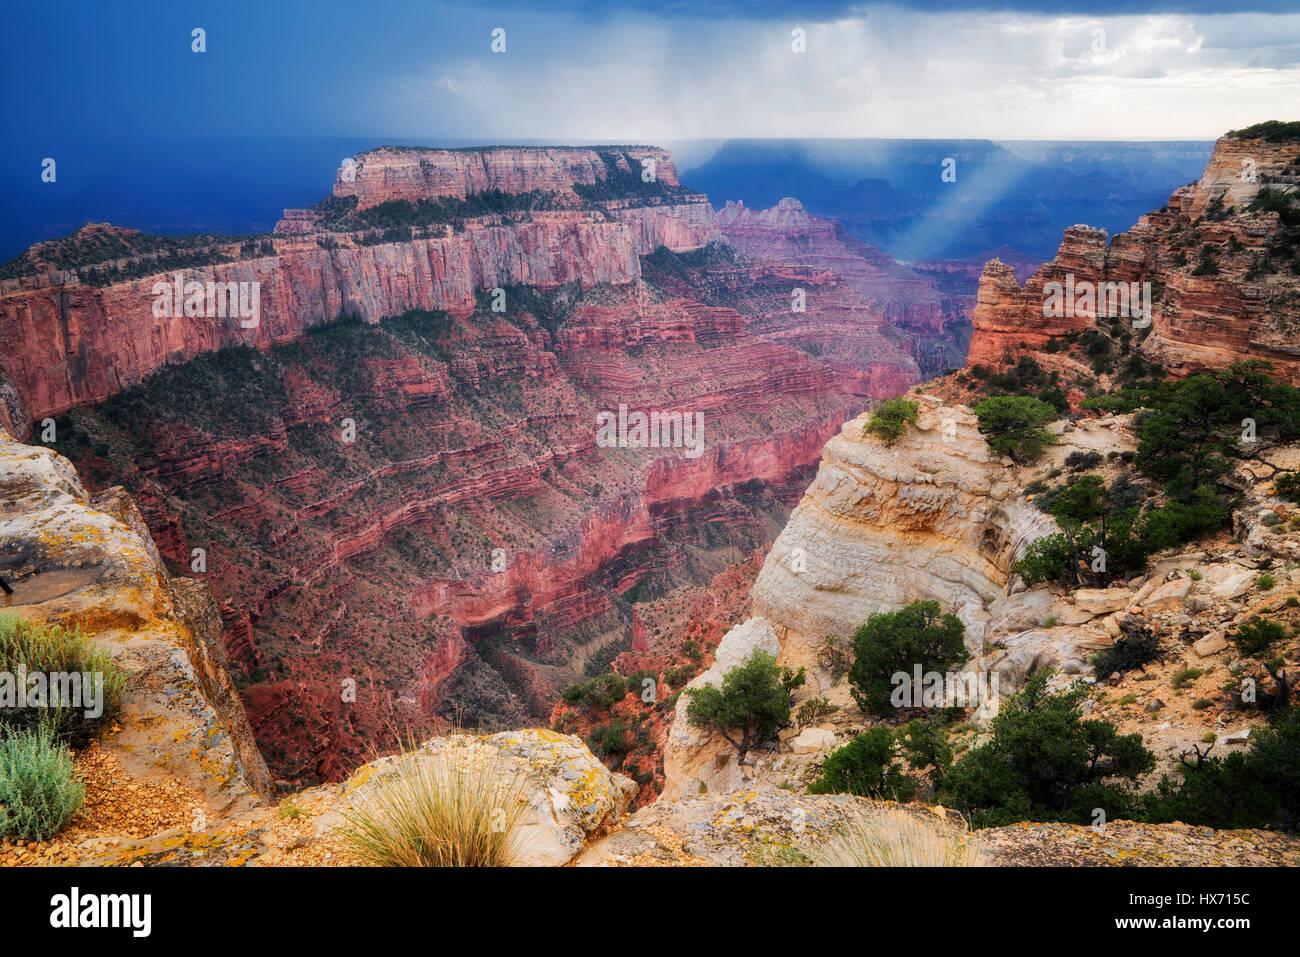 Thunderstorm and shaft of light at Cape Royal. Grand Canyon National Park, Arizona - Stock Image